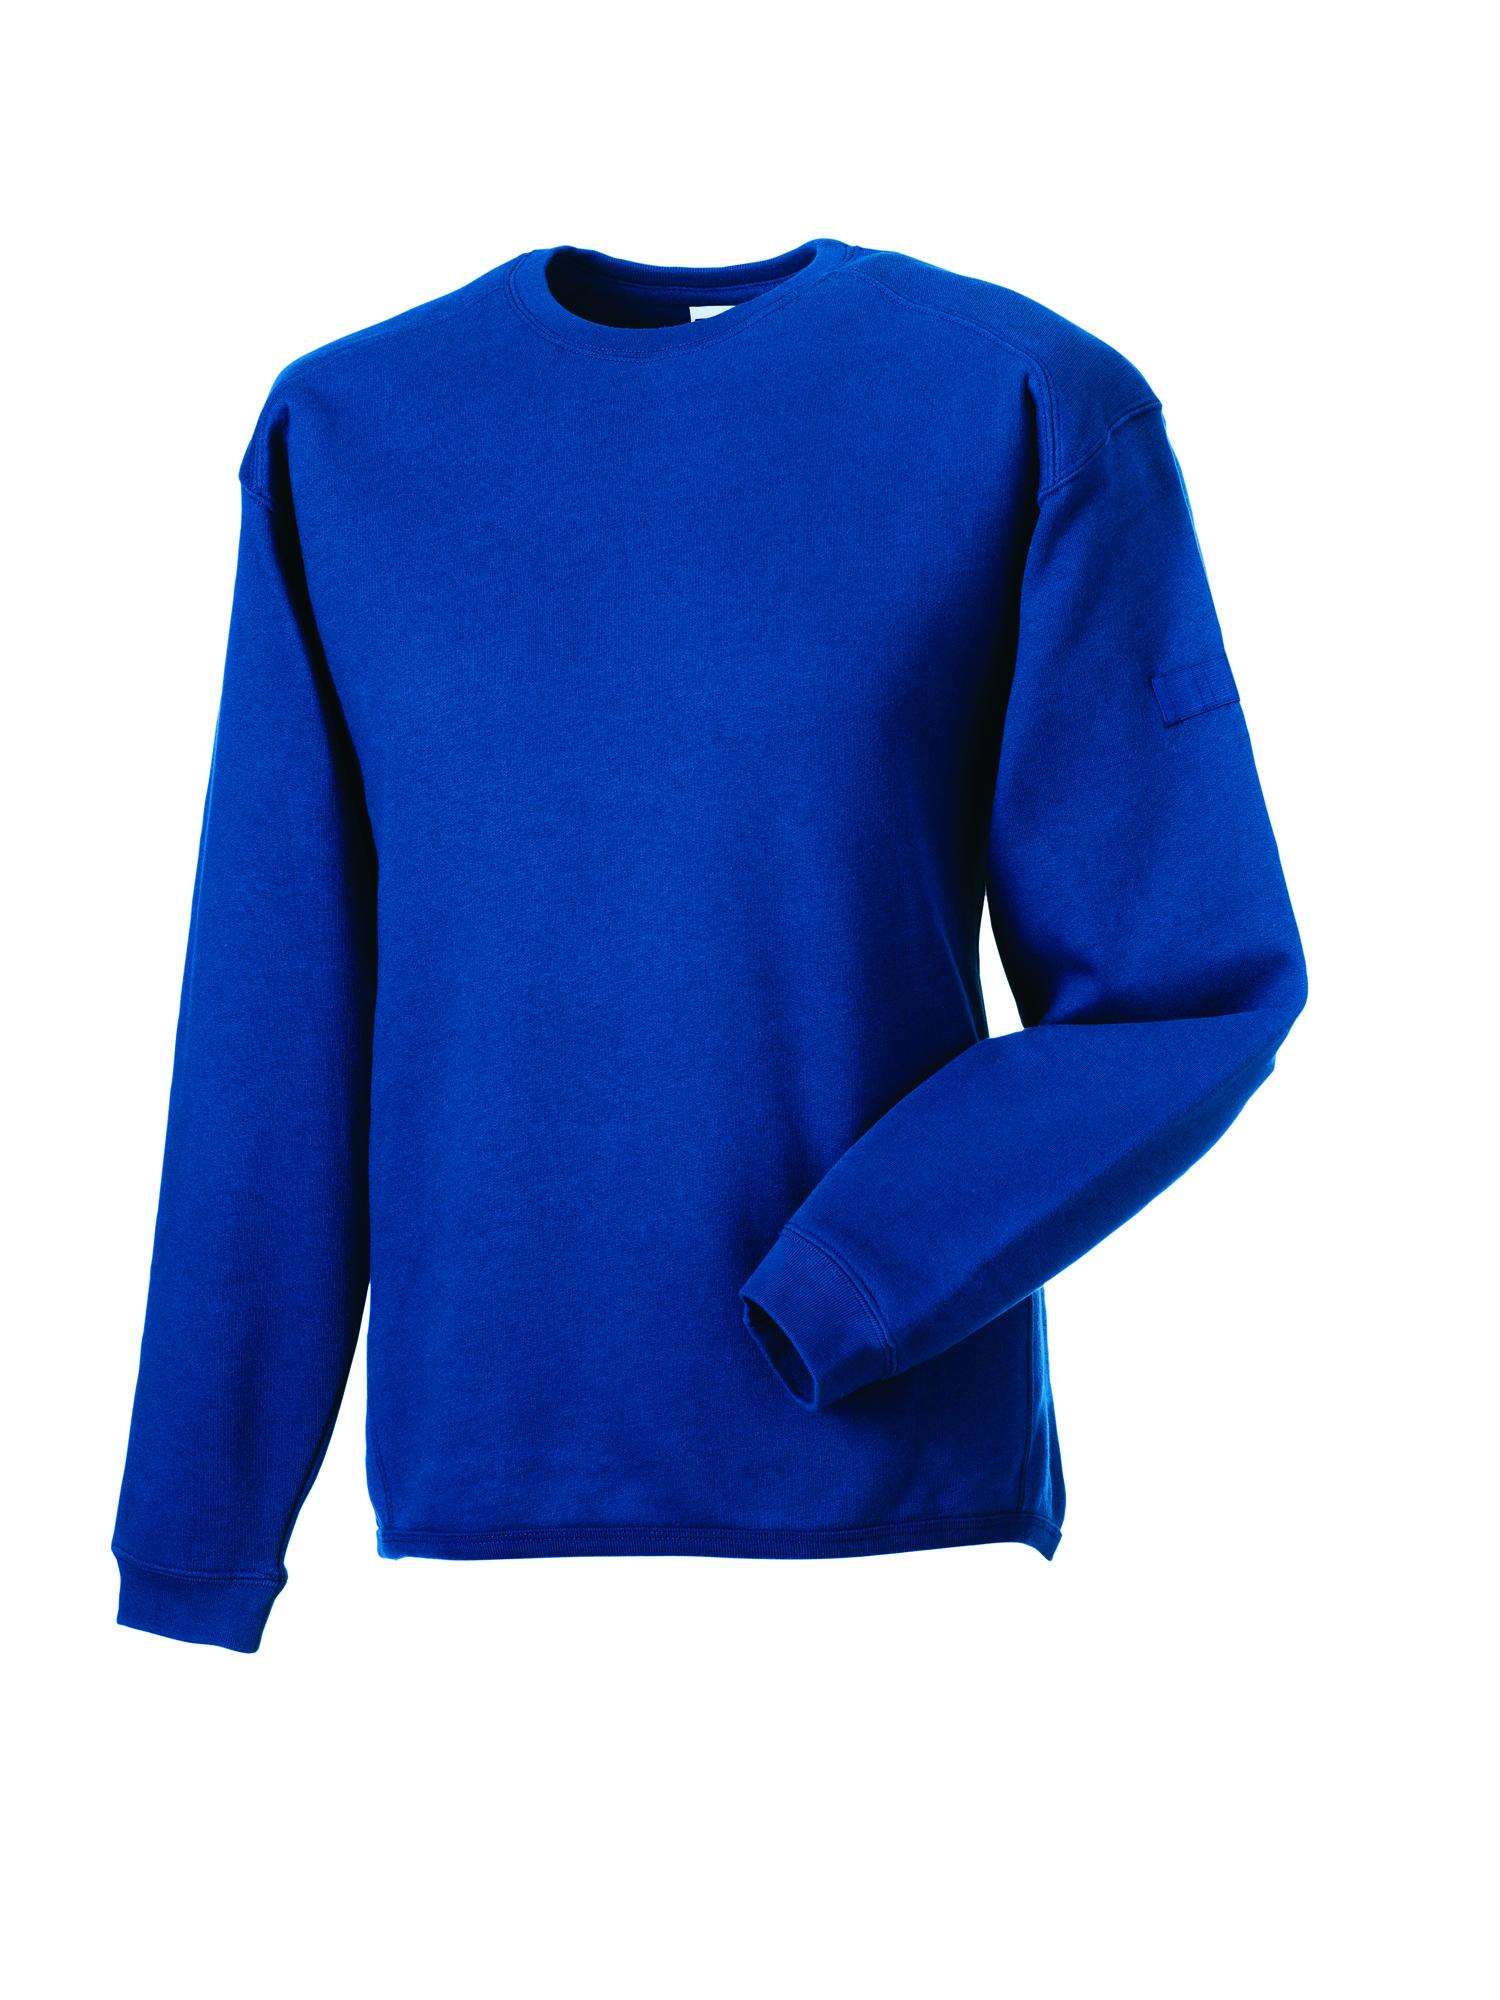 Heavy Duty Crewneck Sweatshirt - Bright Royal - S